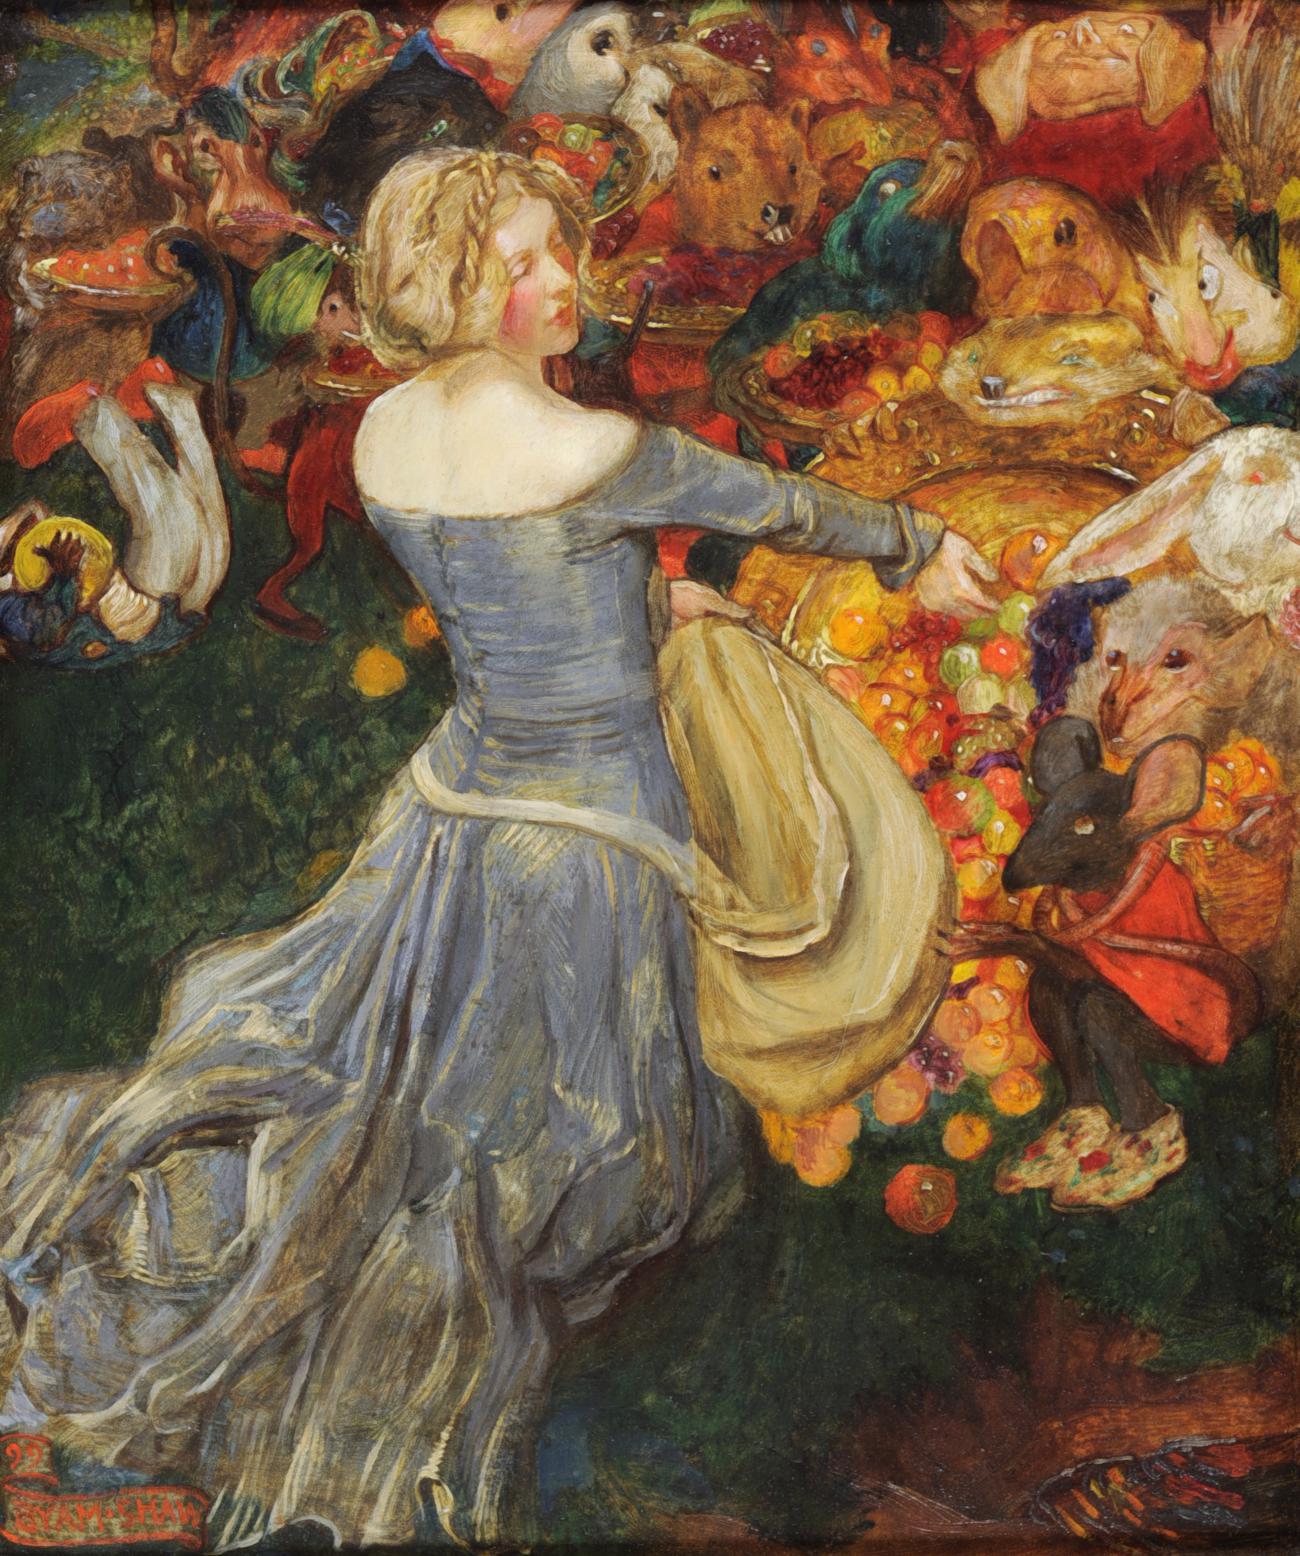 Painting by John Liston Byam Shaw (1872 - 1919).